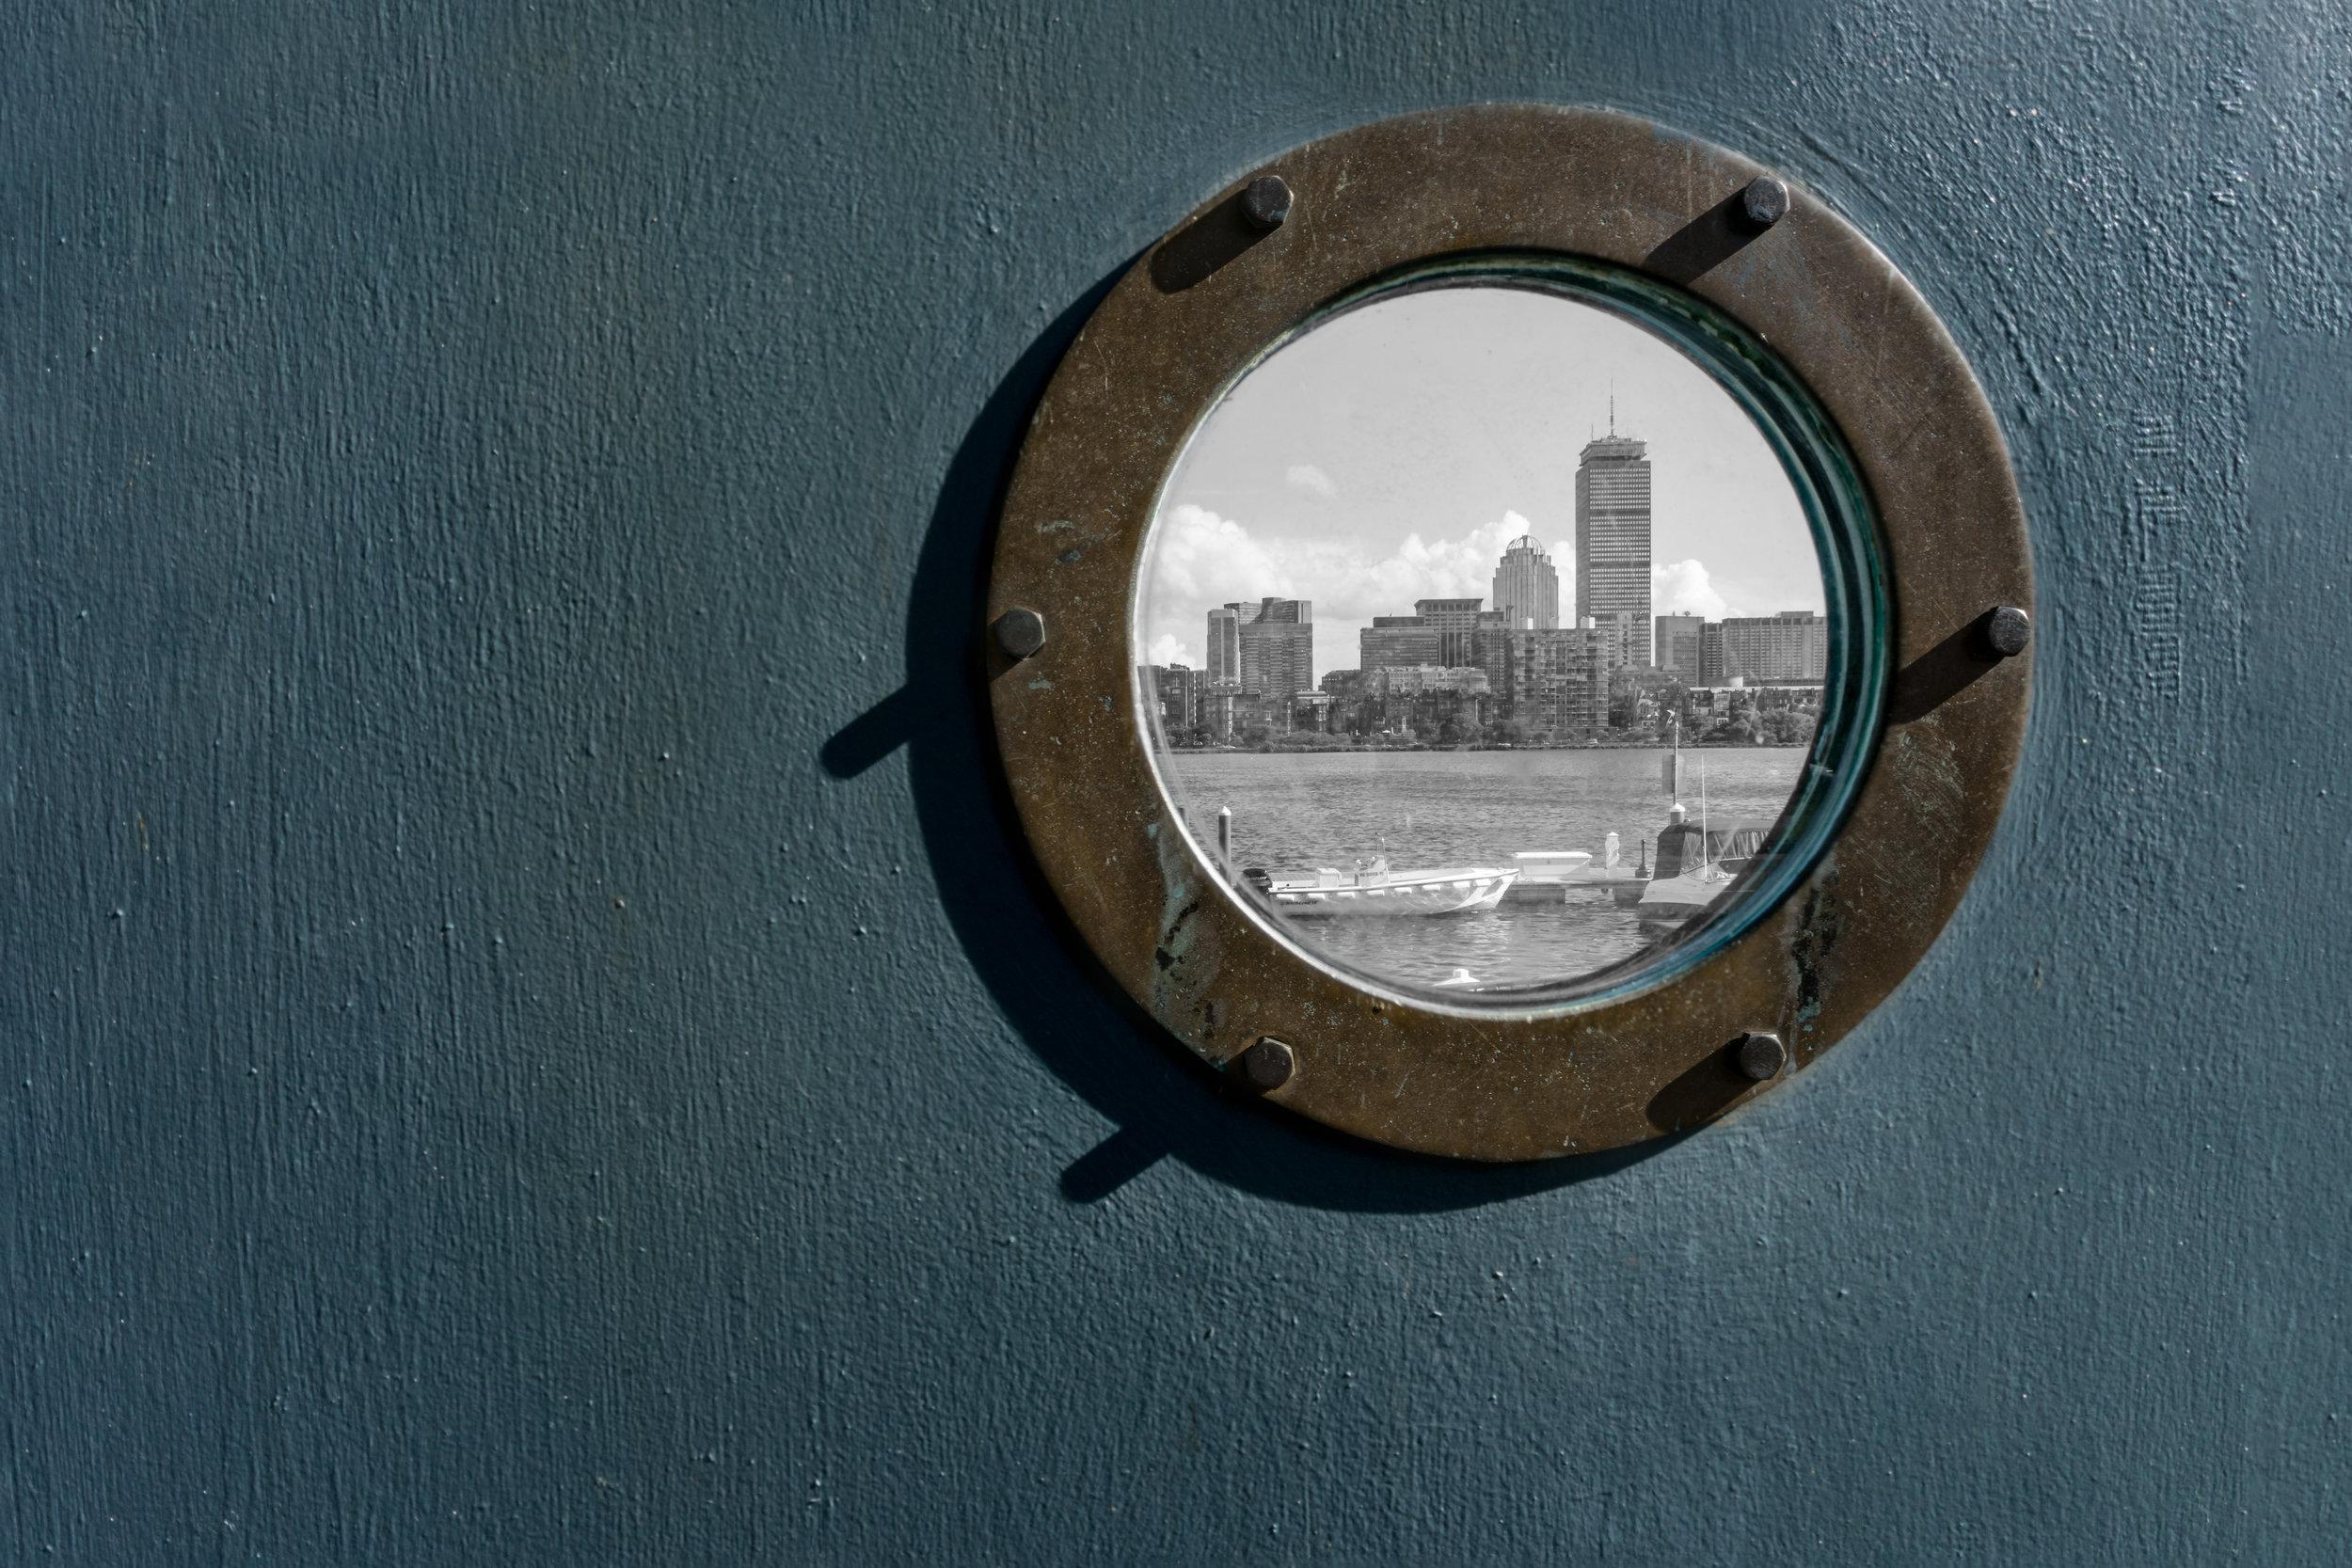 Boston - 13480 - Chris Goetchius 2015.jpg